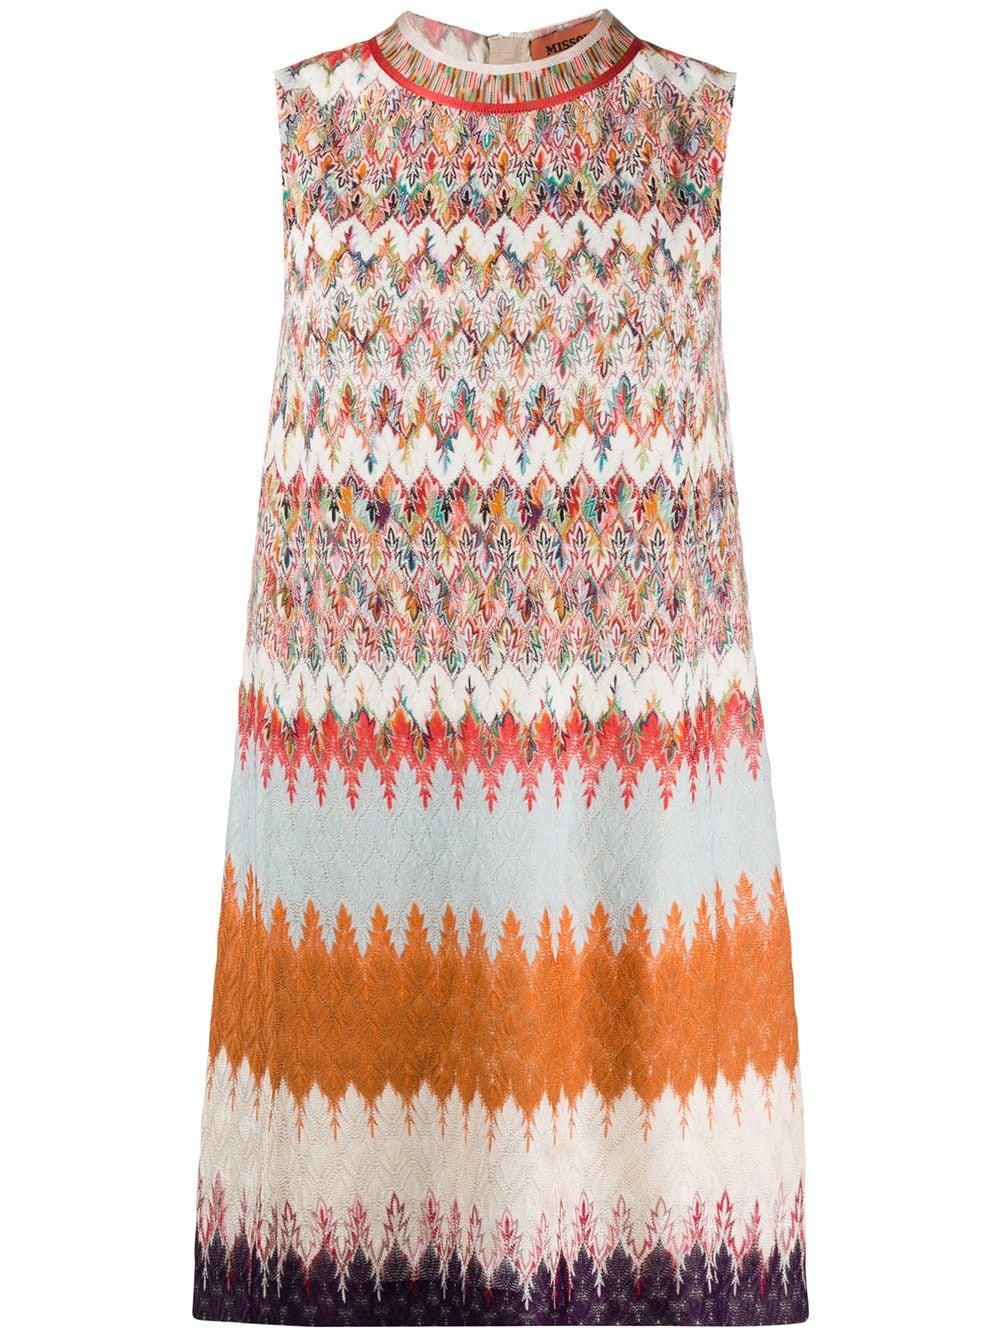 Sleeveless A- Line Dress Item # MDG00513-BR007T